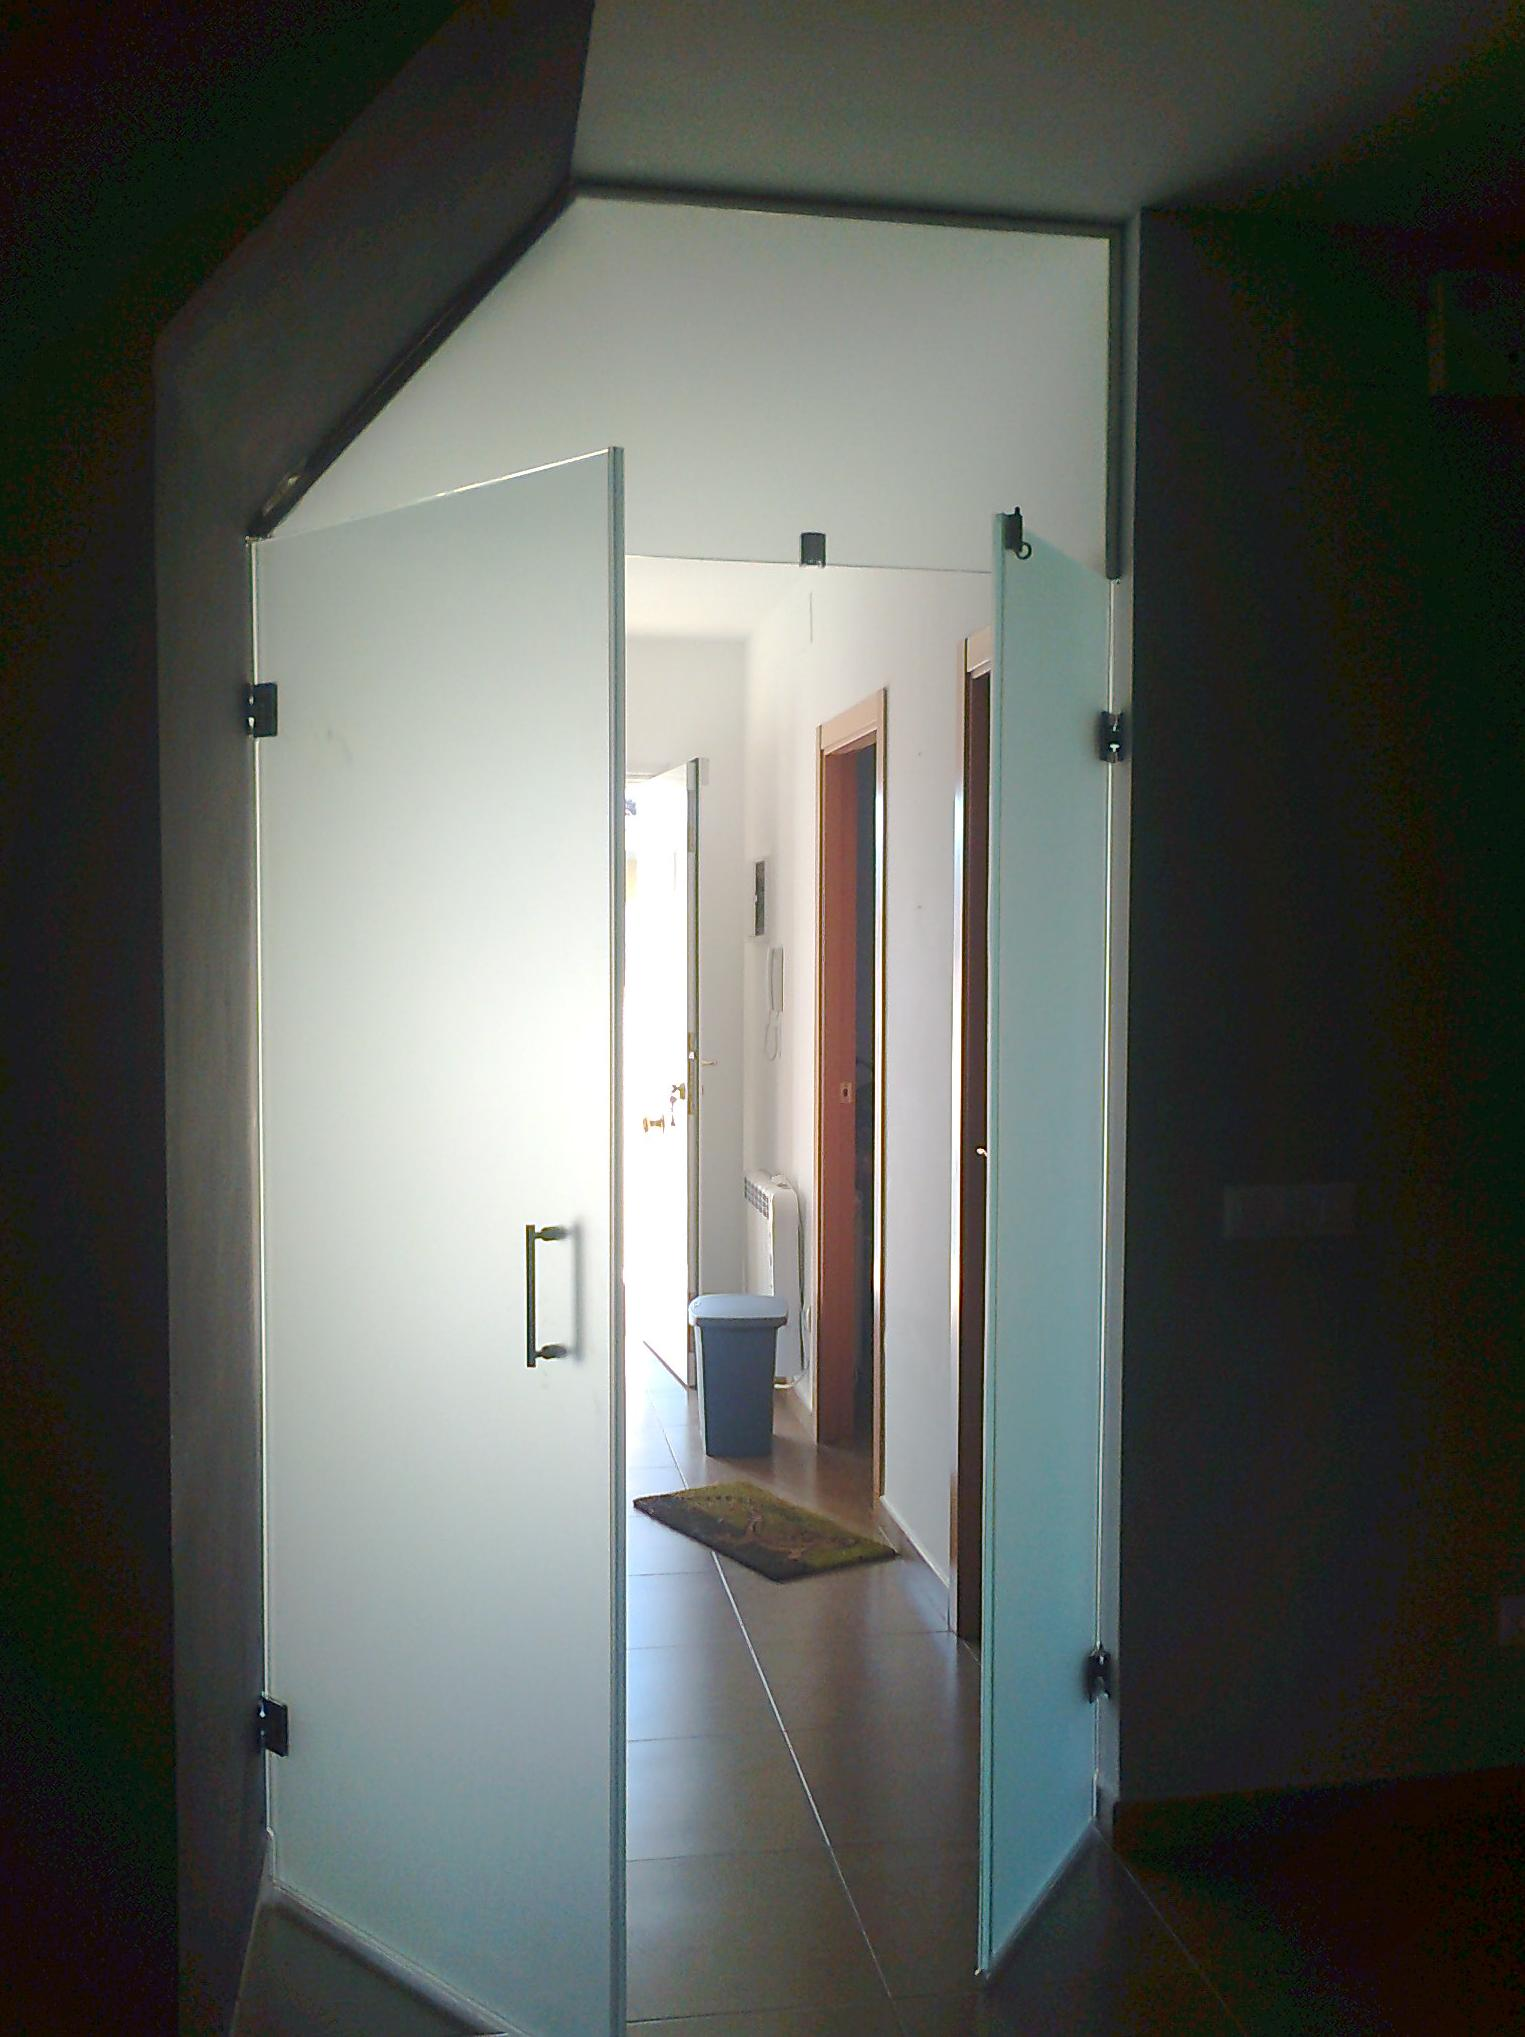 Cierres de interiores: Catálogo de LMC Glass